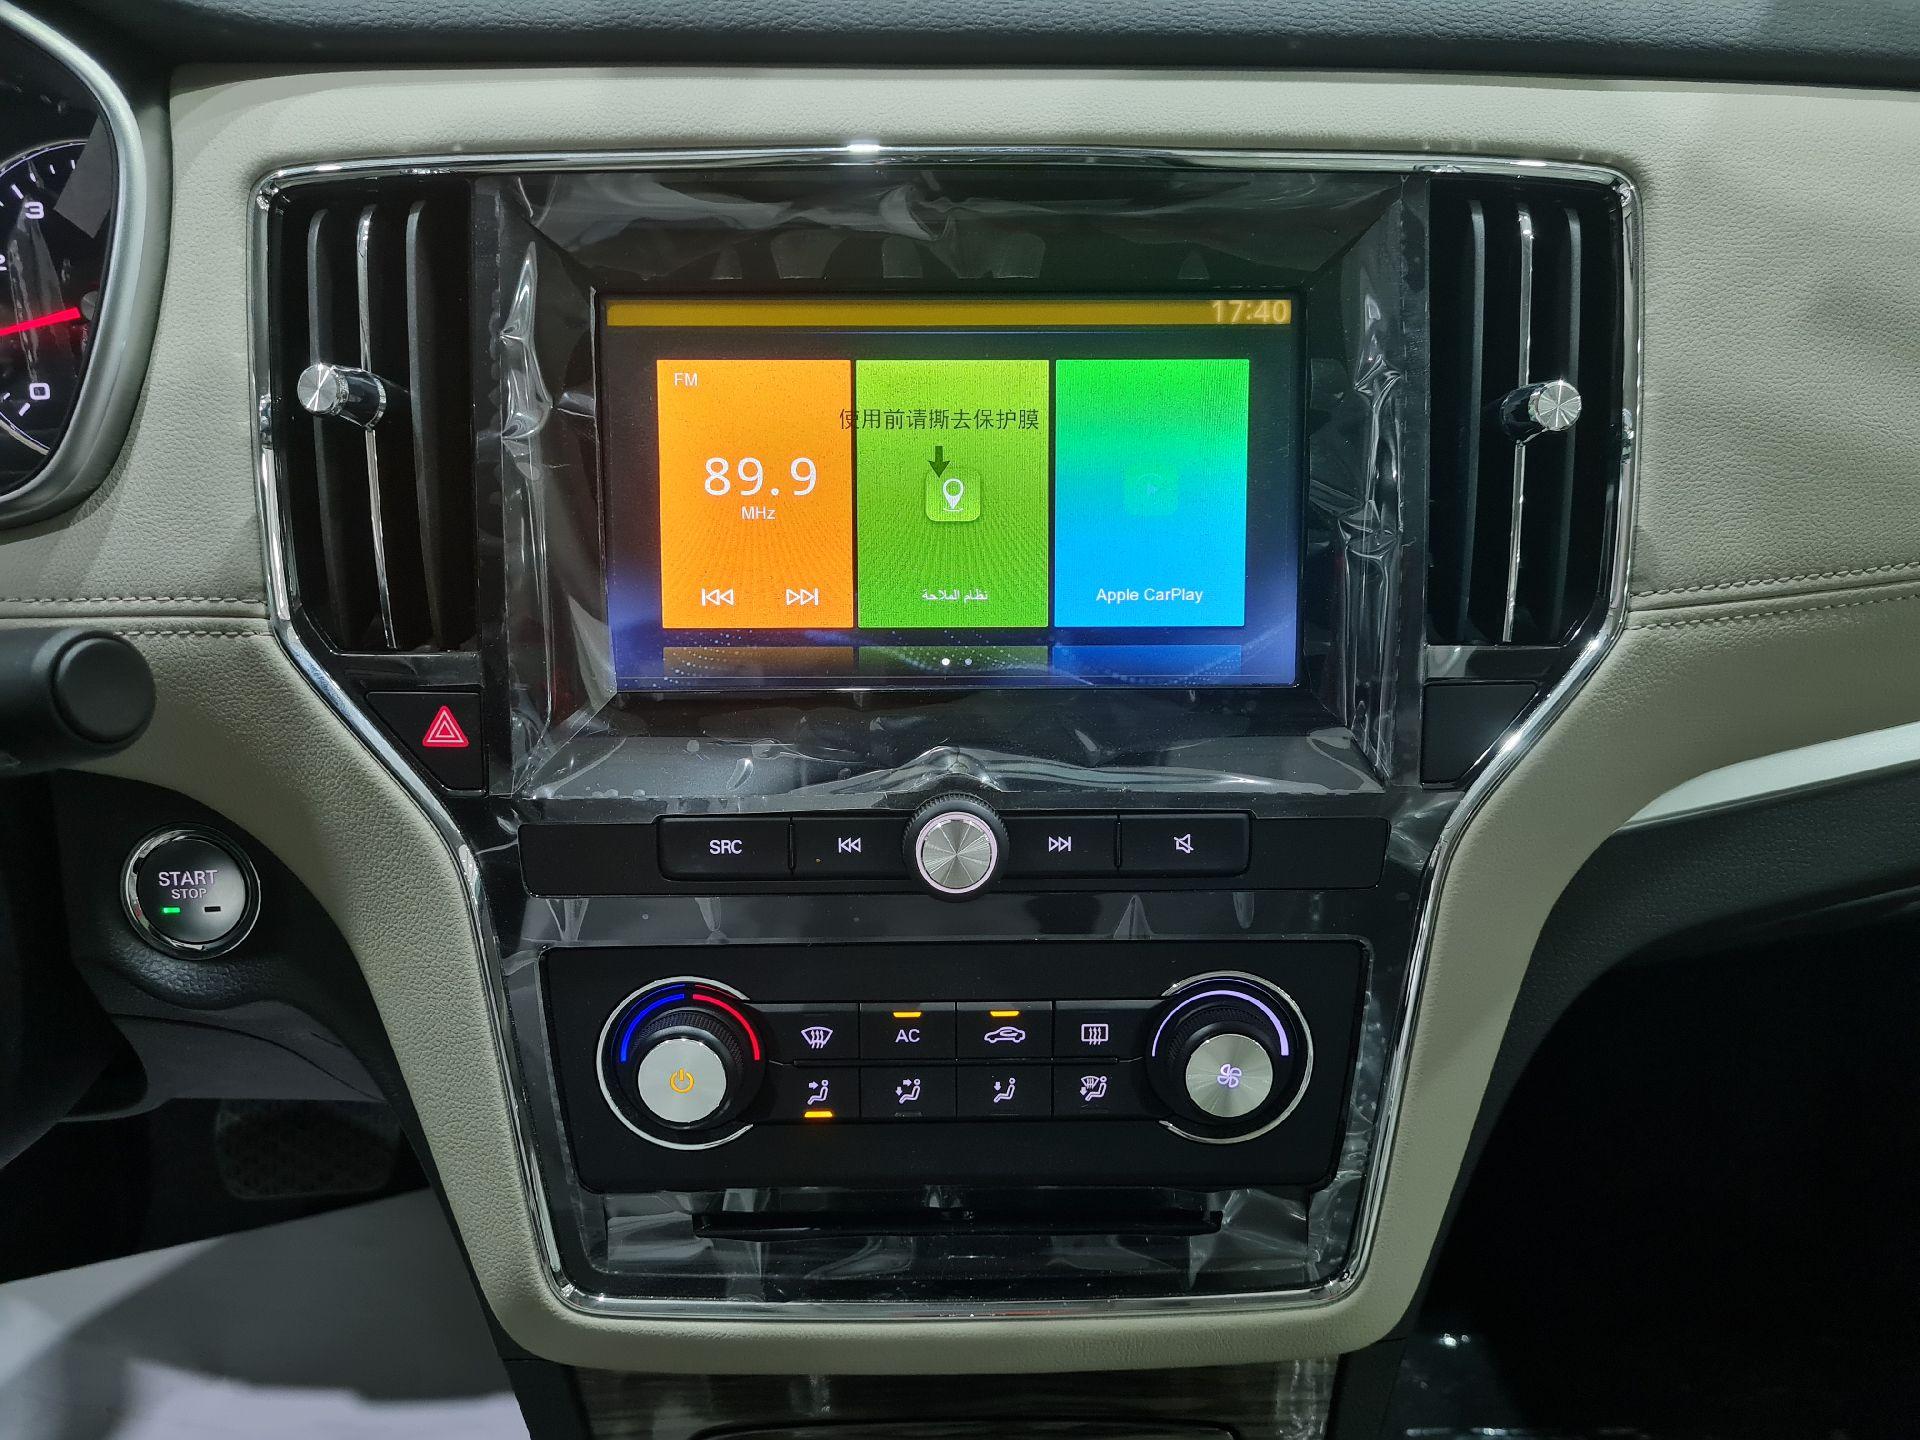 MG RX5 LUX 2020 فل سعودي للبيع في الرياض - السعودية - صورة كبيرة - 13